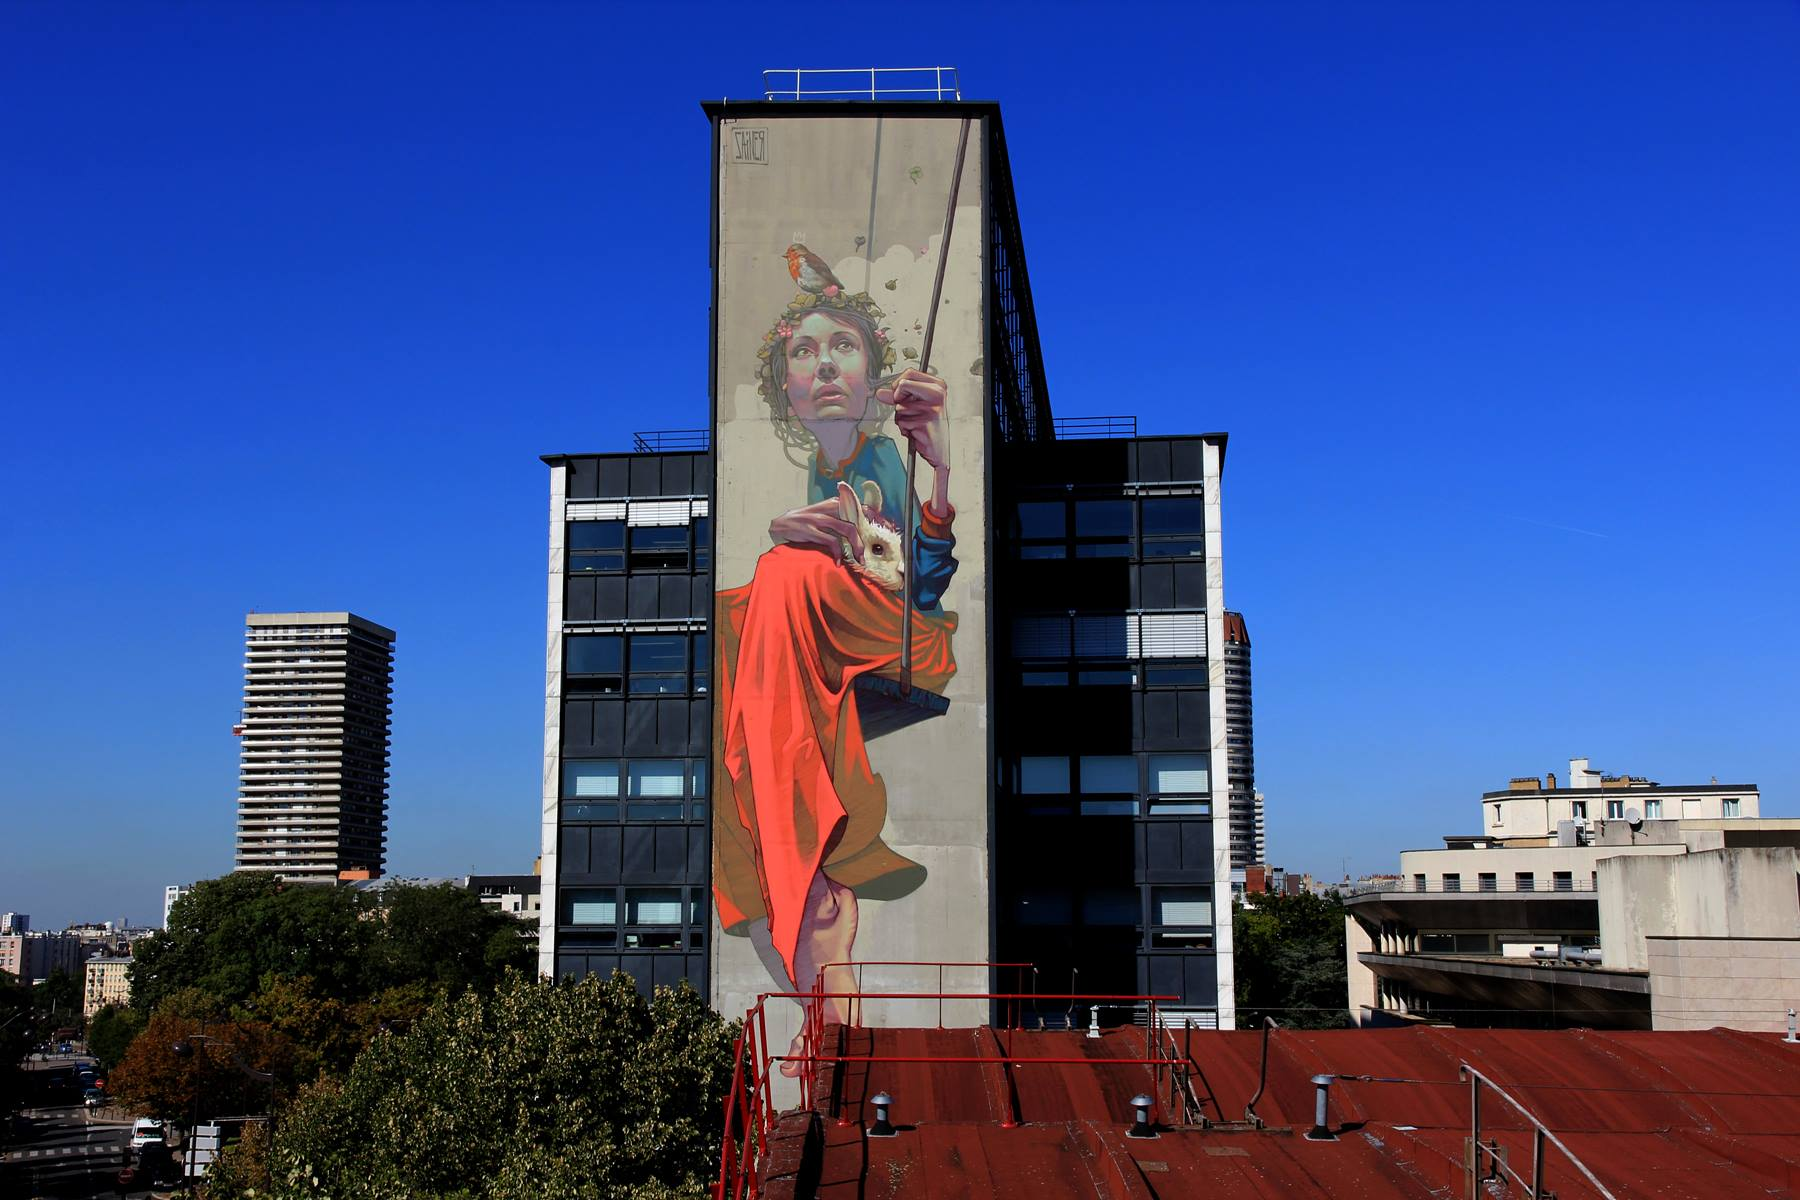 etam-cru-bezt-sainer-street-art-large-murals-15